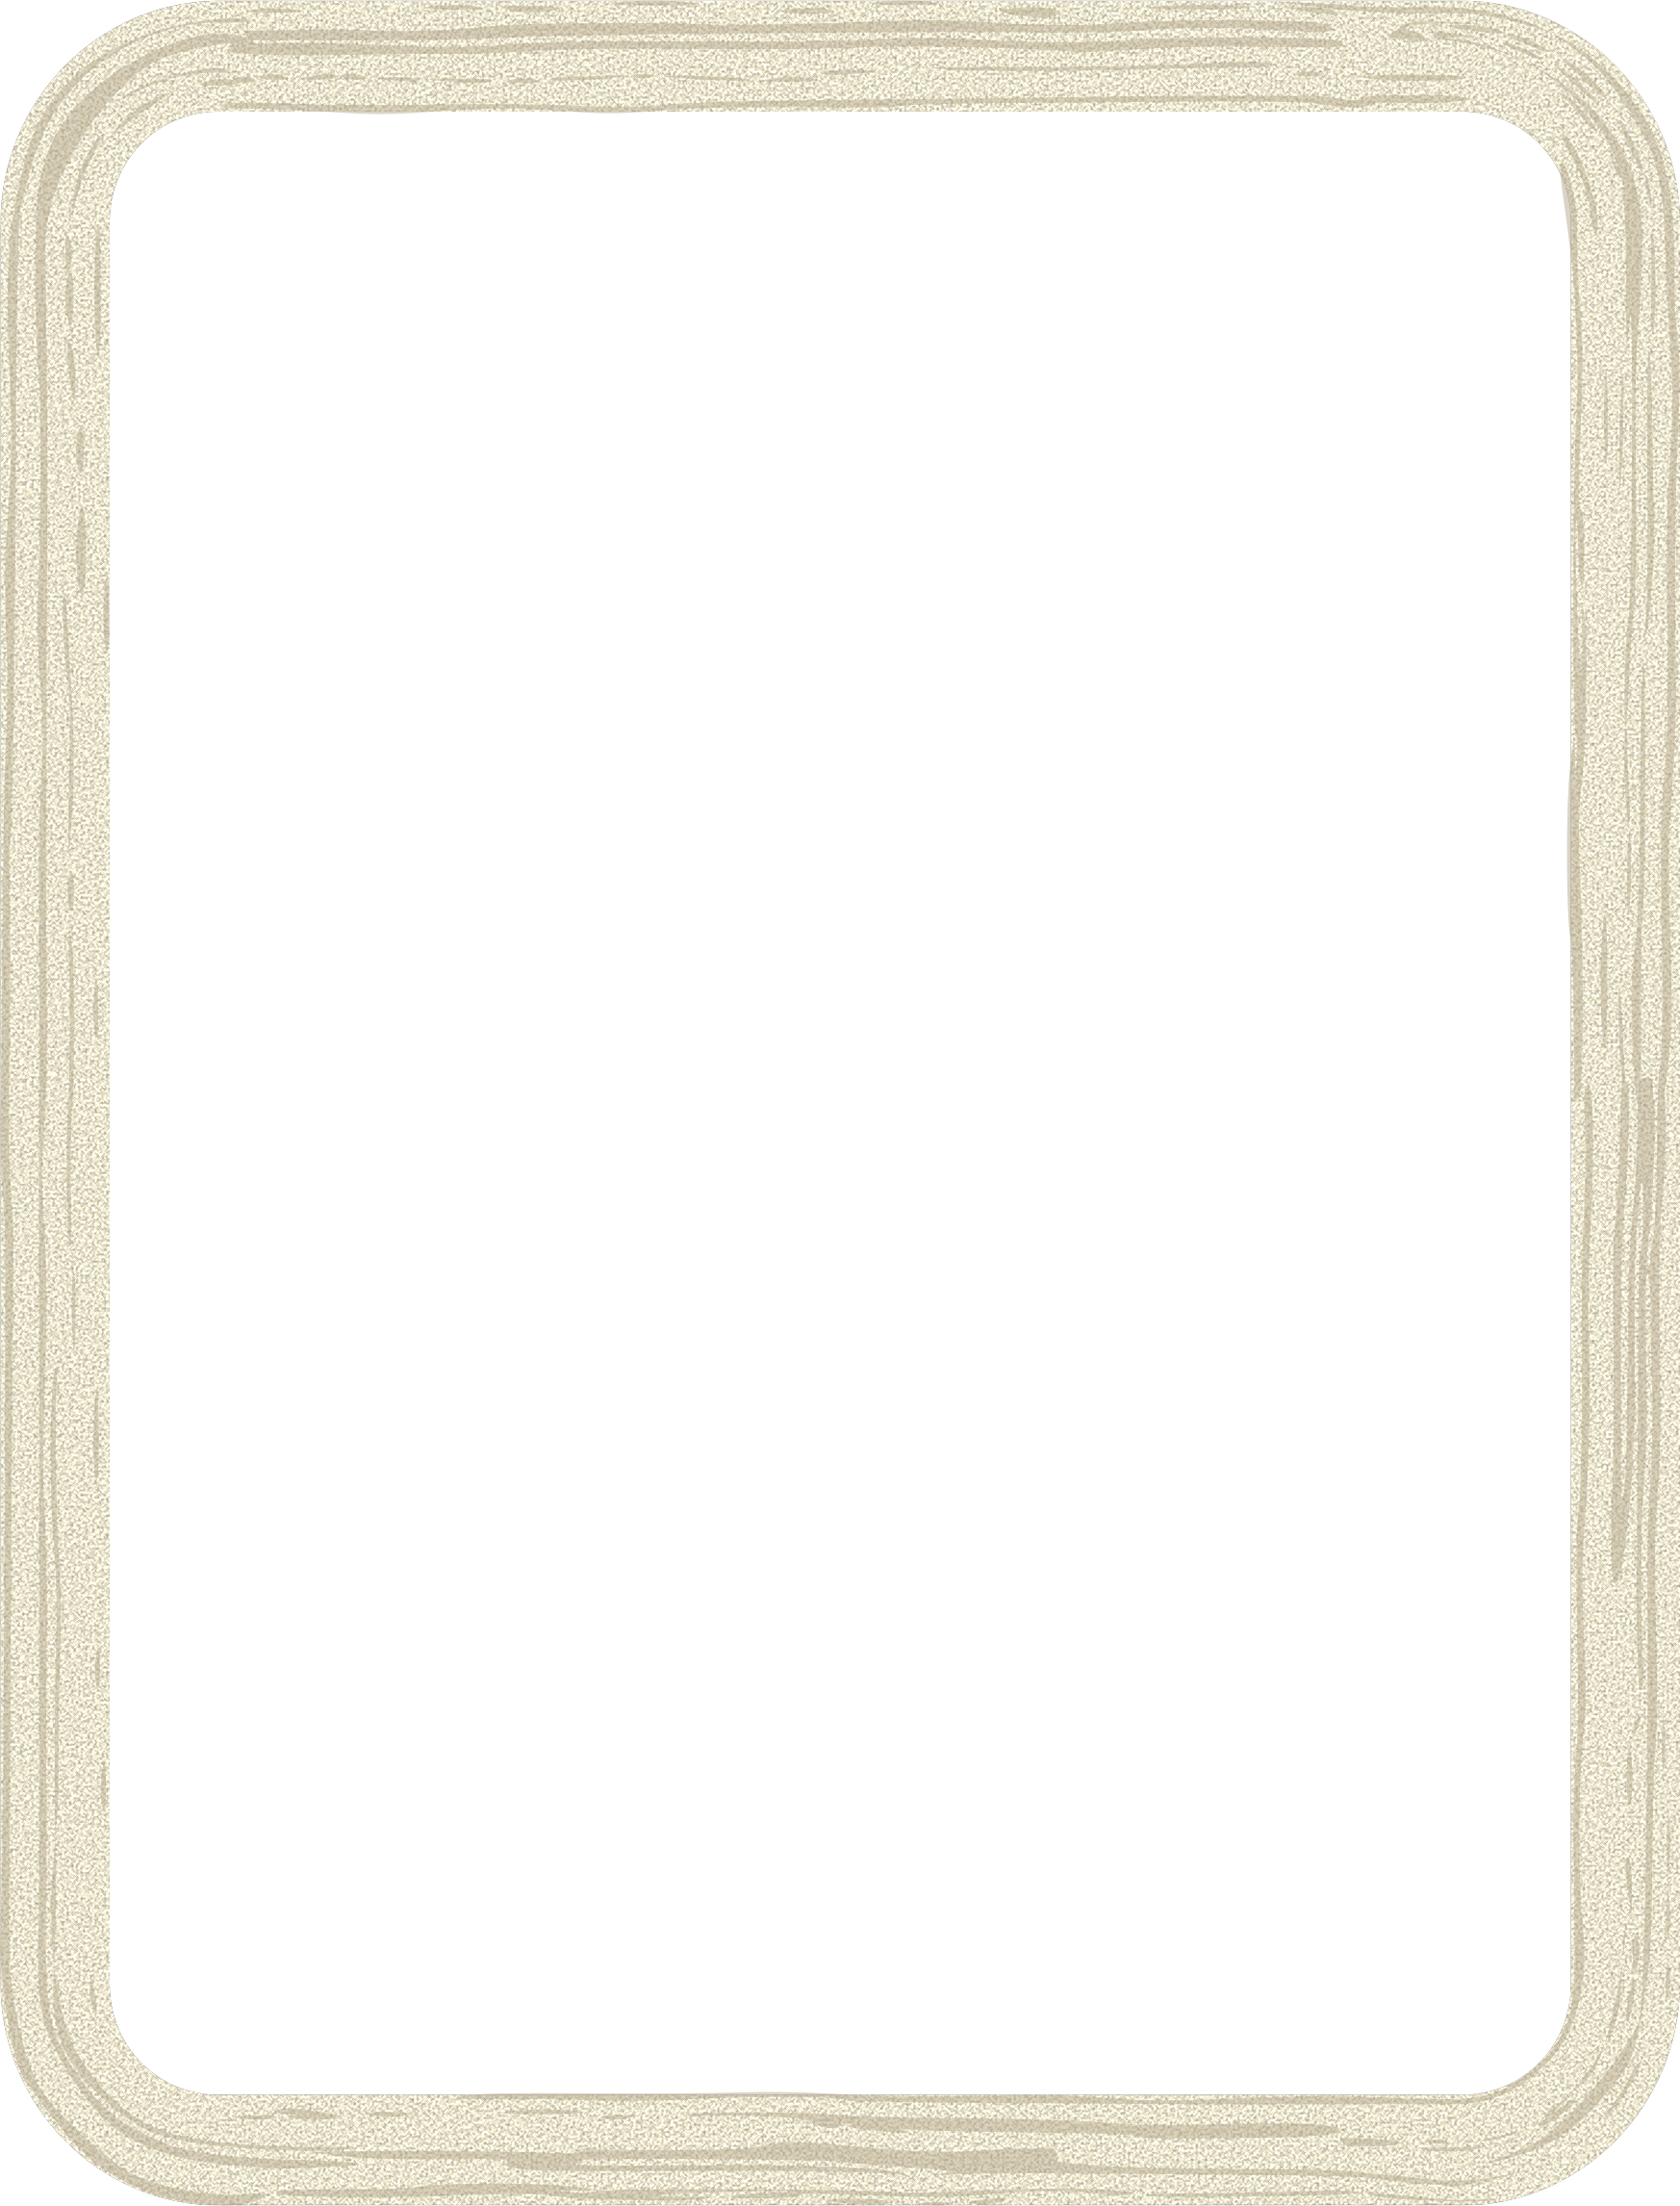 Clipart big image. Wood border png